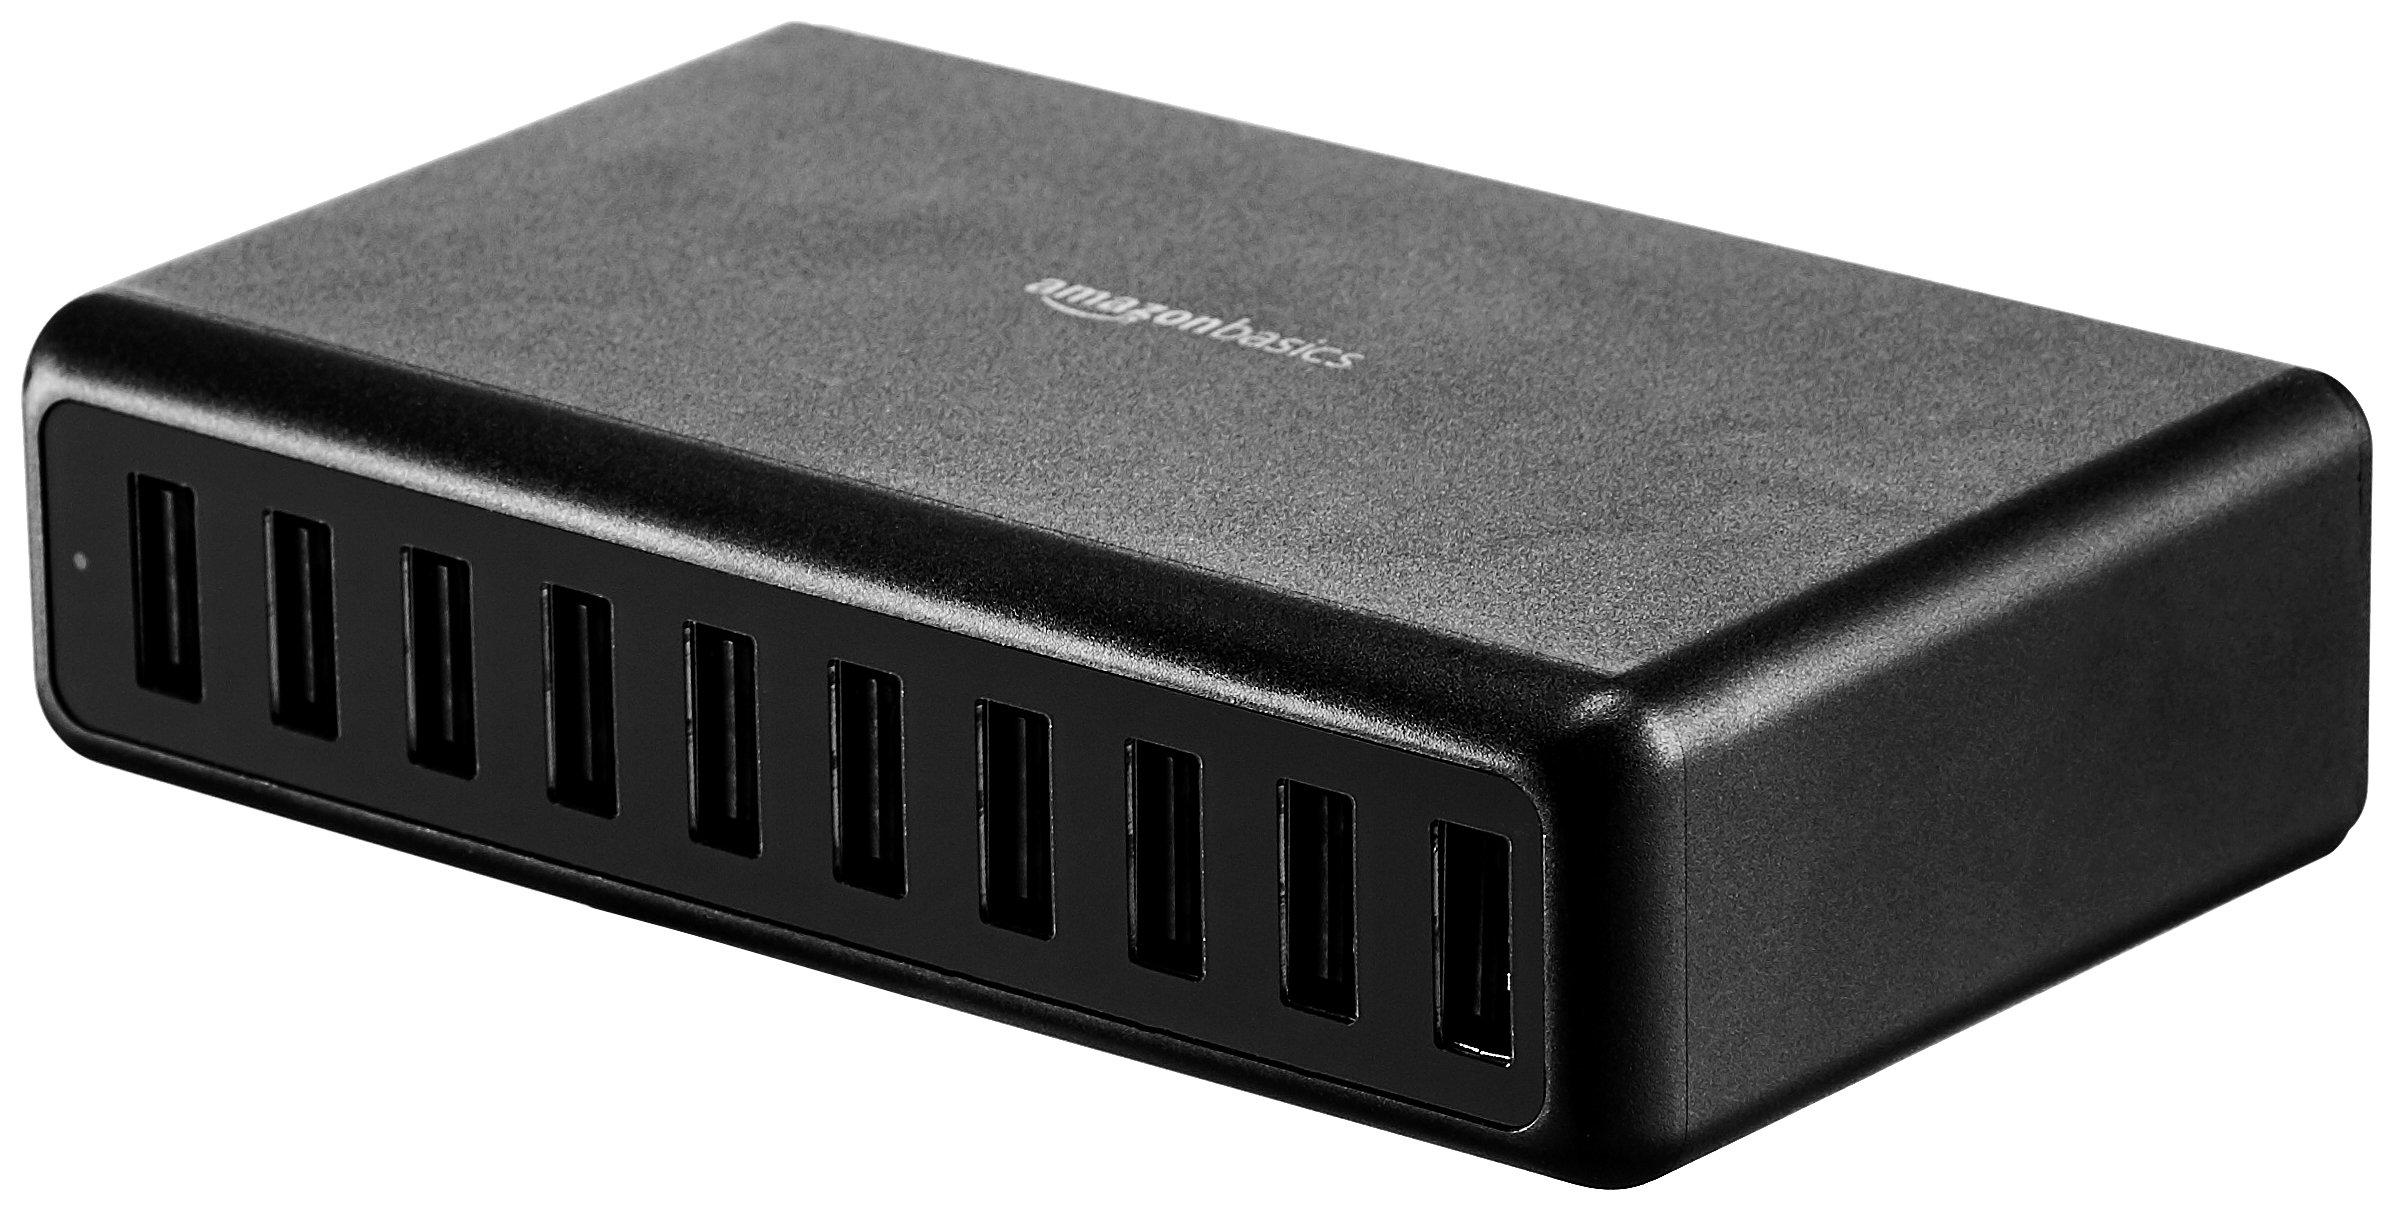 AmazonBasics 60W 10-Port Multi USB Wall Charger, Black by AmazonBasics